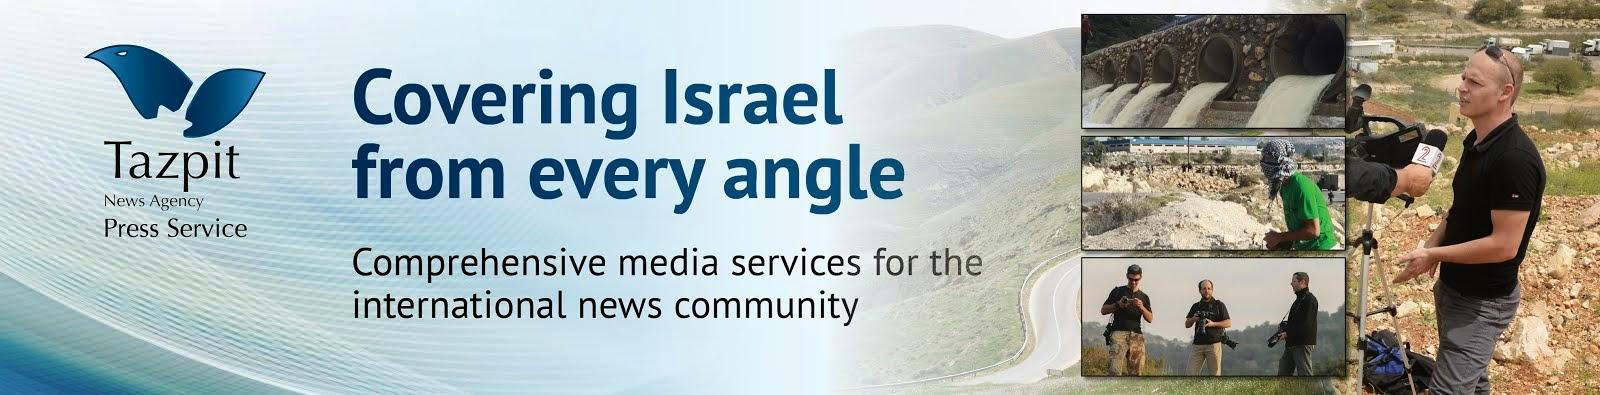 Tazpit News Service